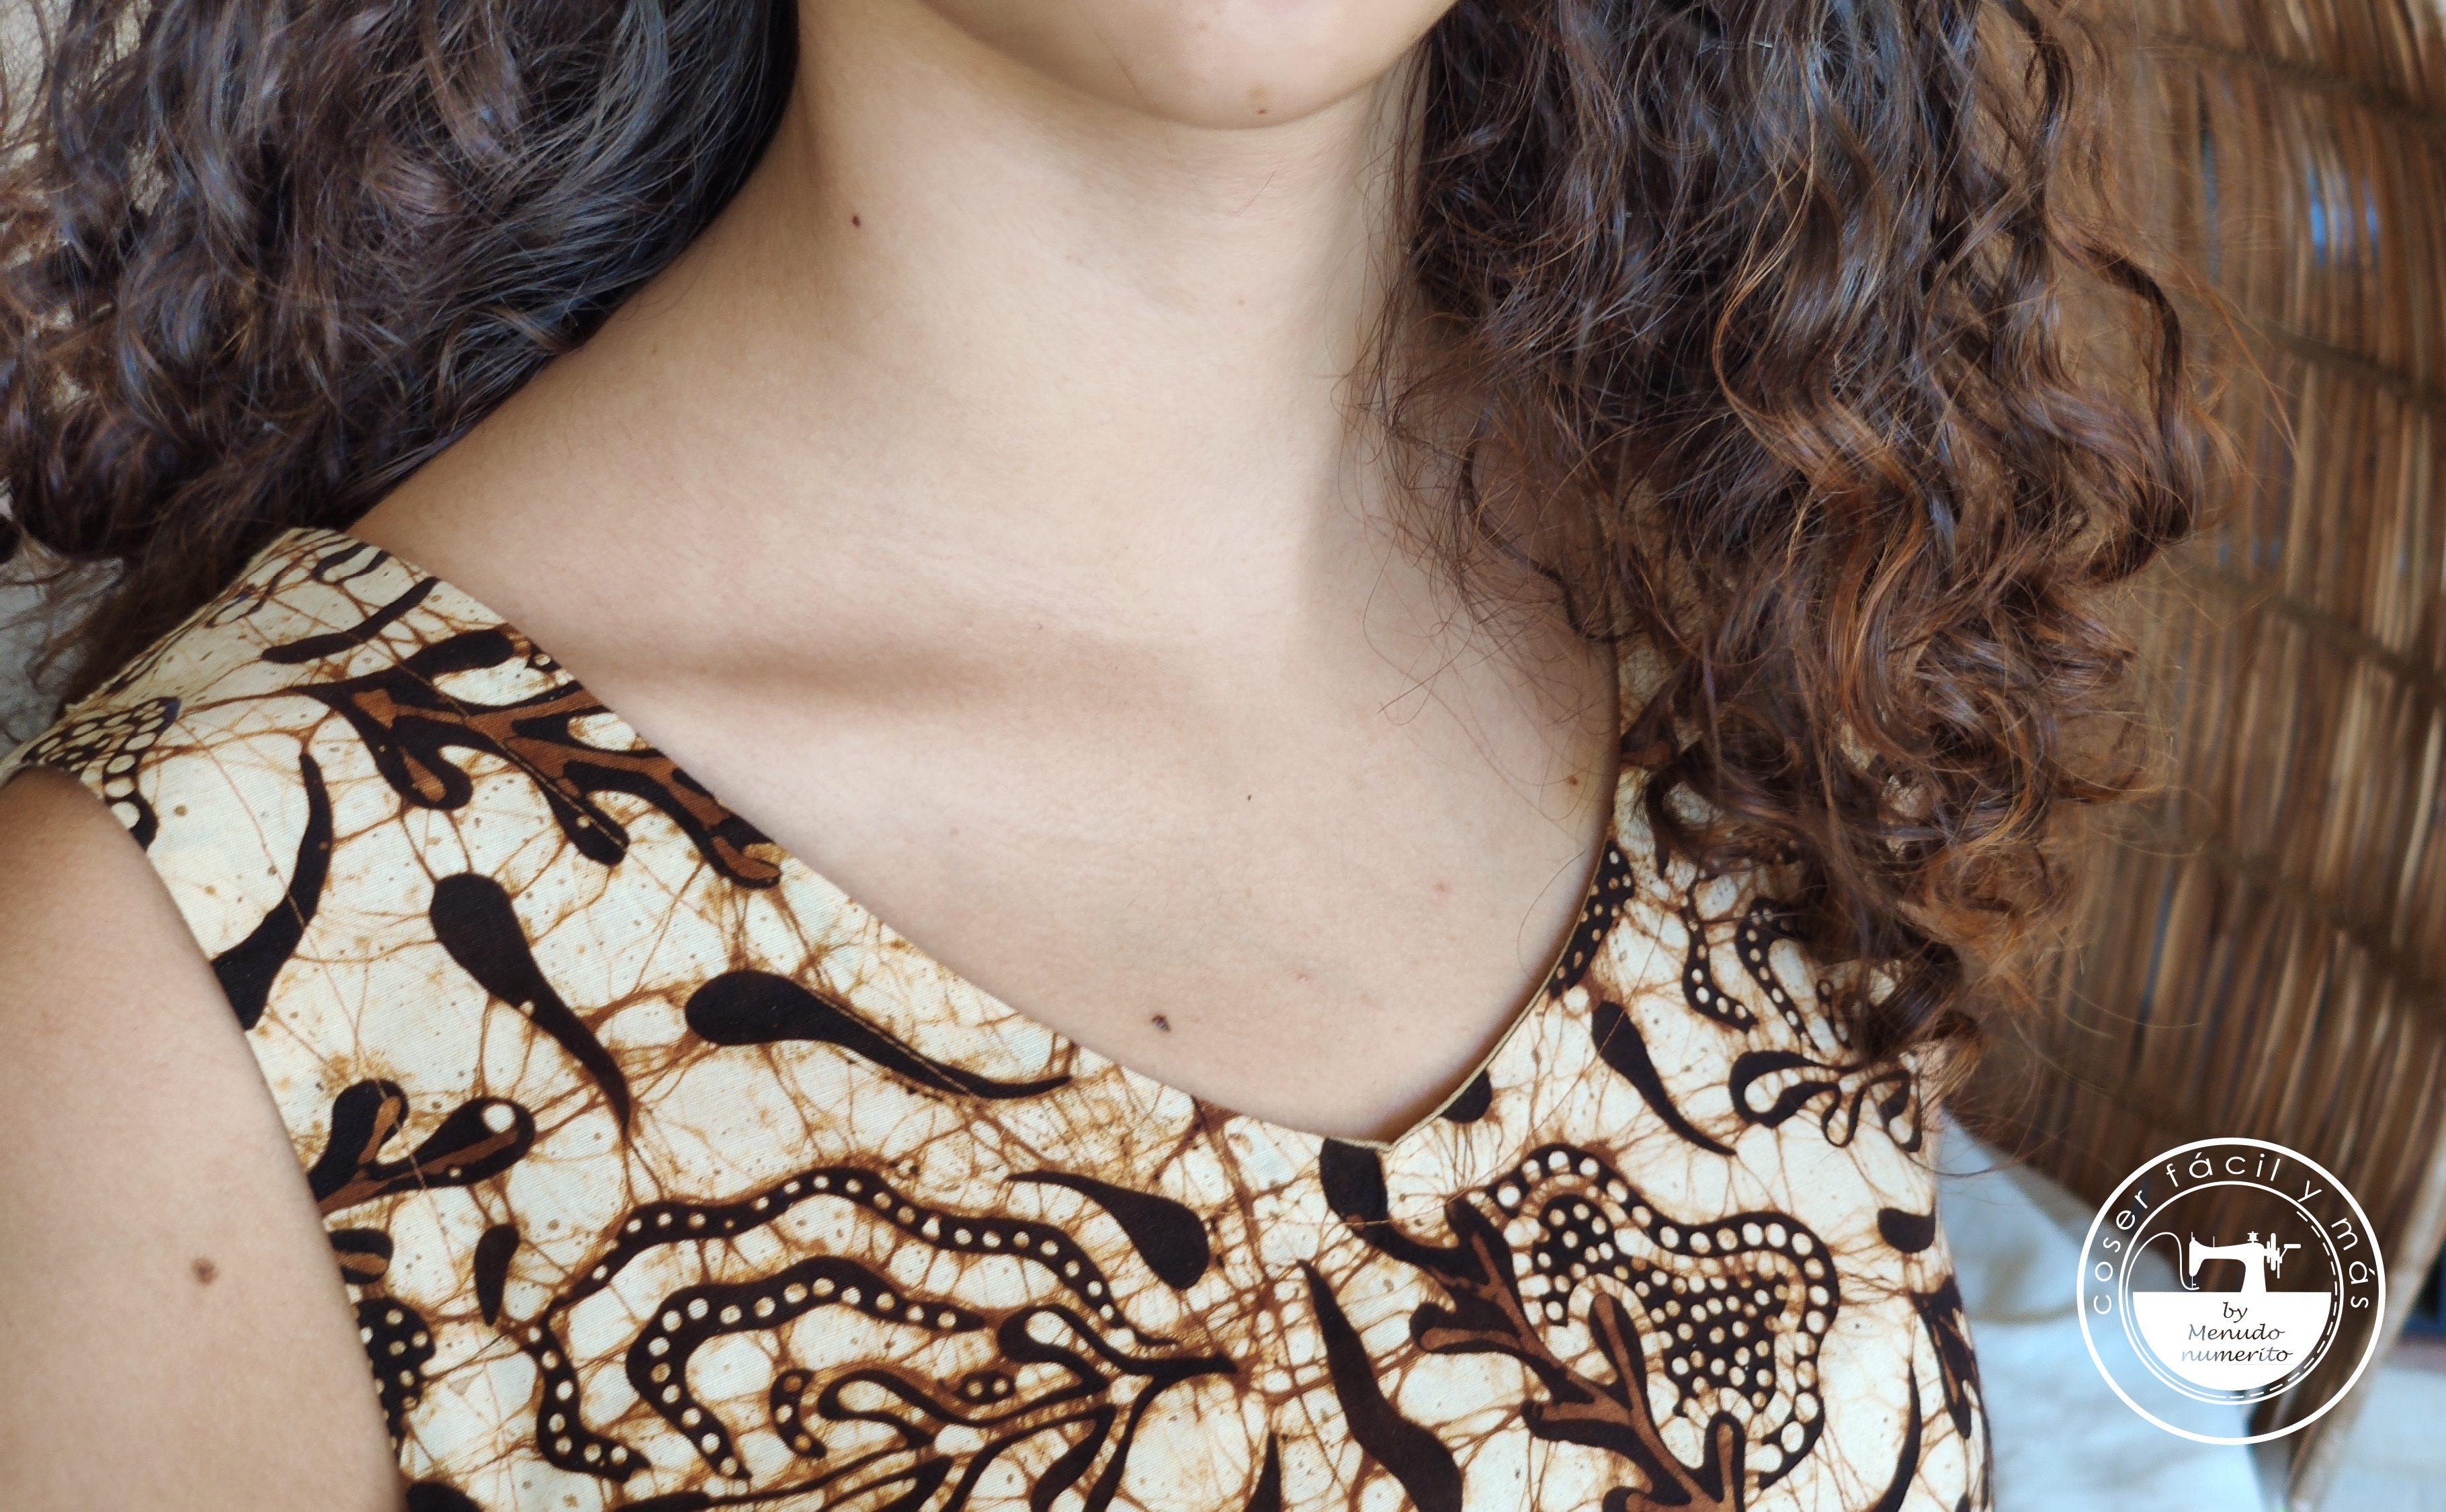 blusa asimétrica menudo numerito blogs de costura